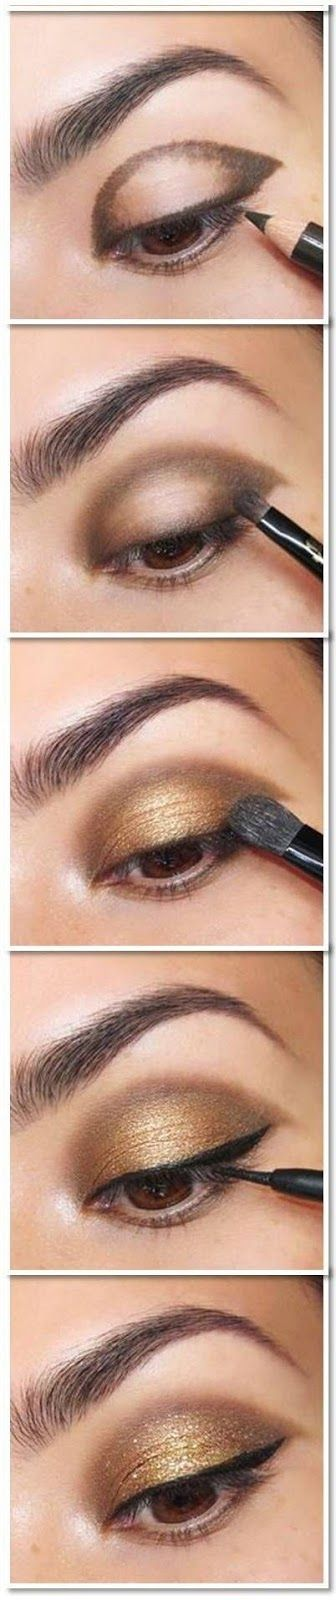 "A Smokey Eye Makeup Tutorial You Must Read  ‖Gold Smoky Eye ‖ Click Here to Get Free ""Mieoko Kabuki Brush"" ‖"